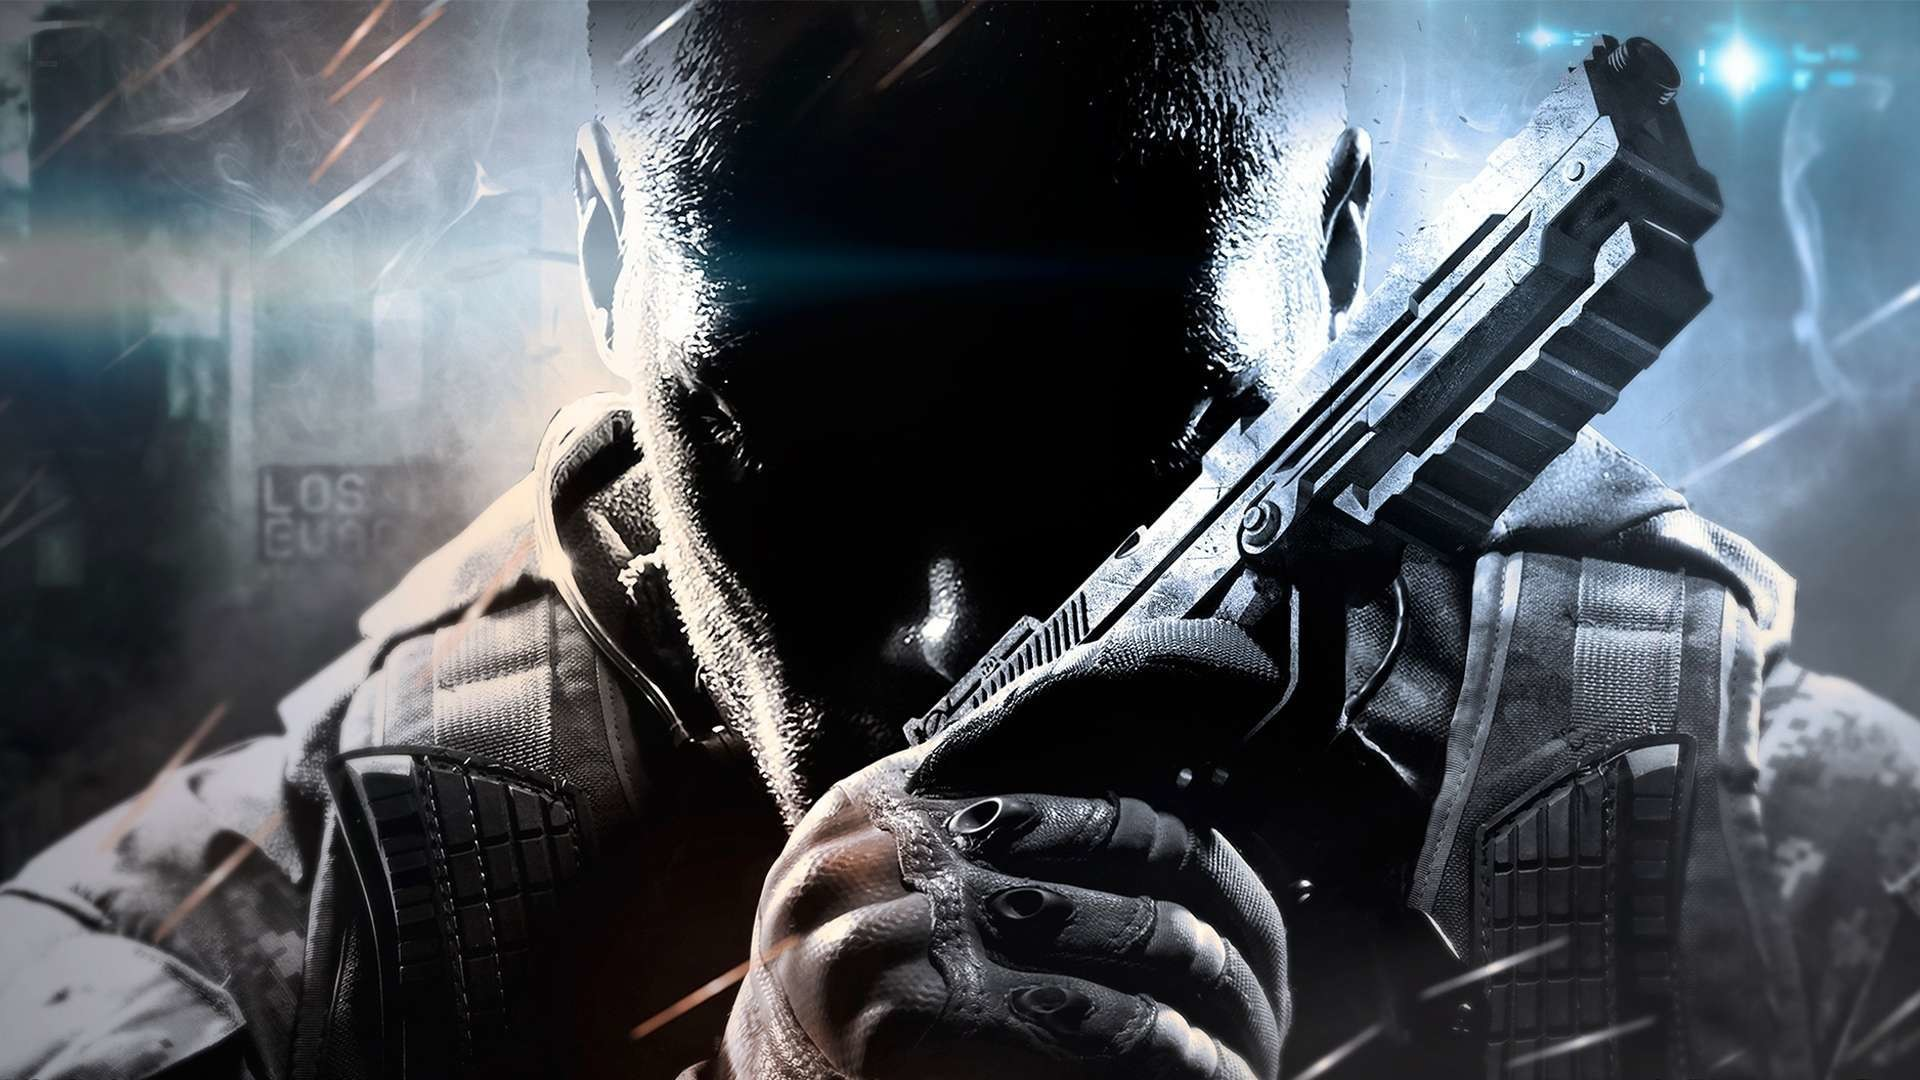 HQ Call of Duty Black Ops III Wallpaper